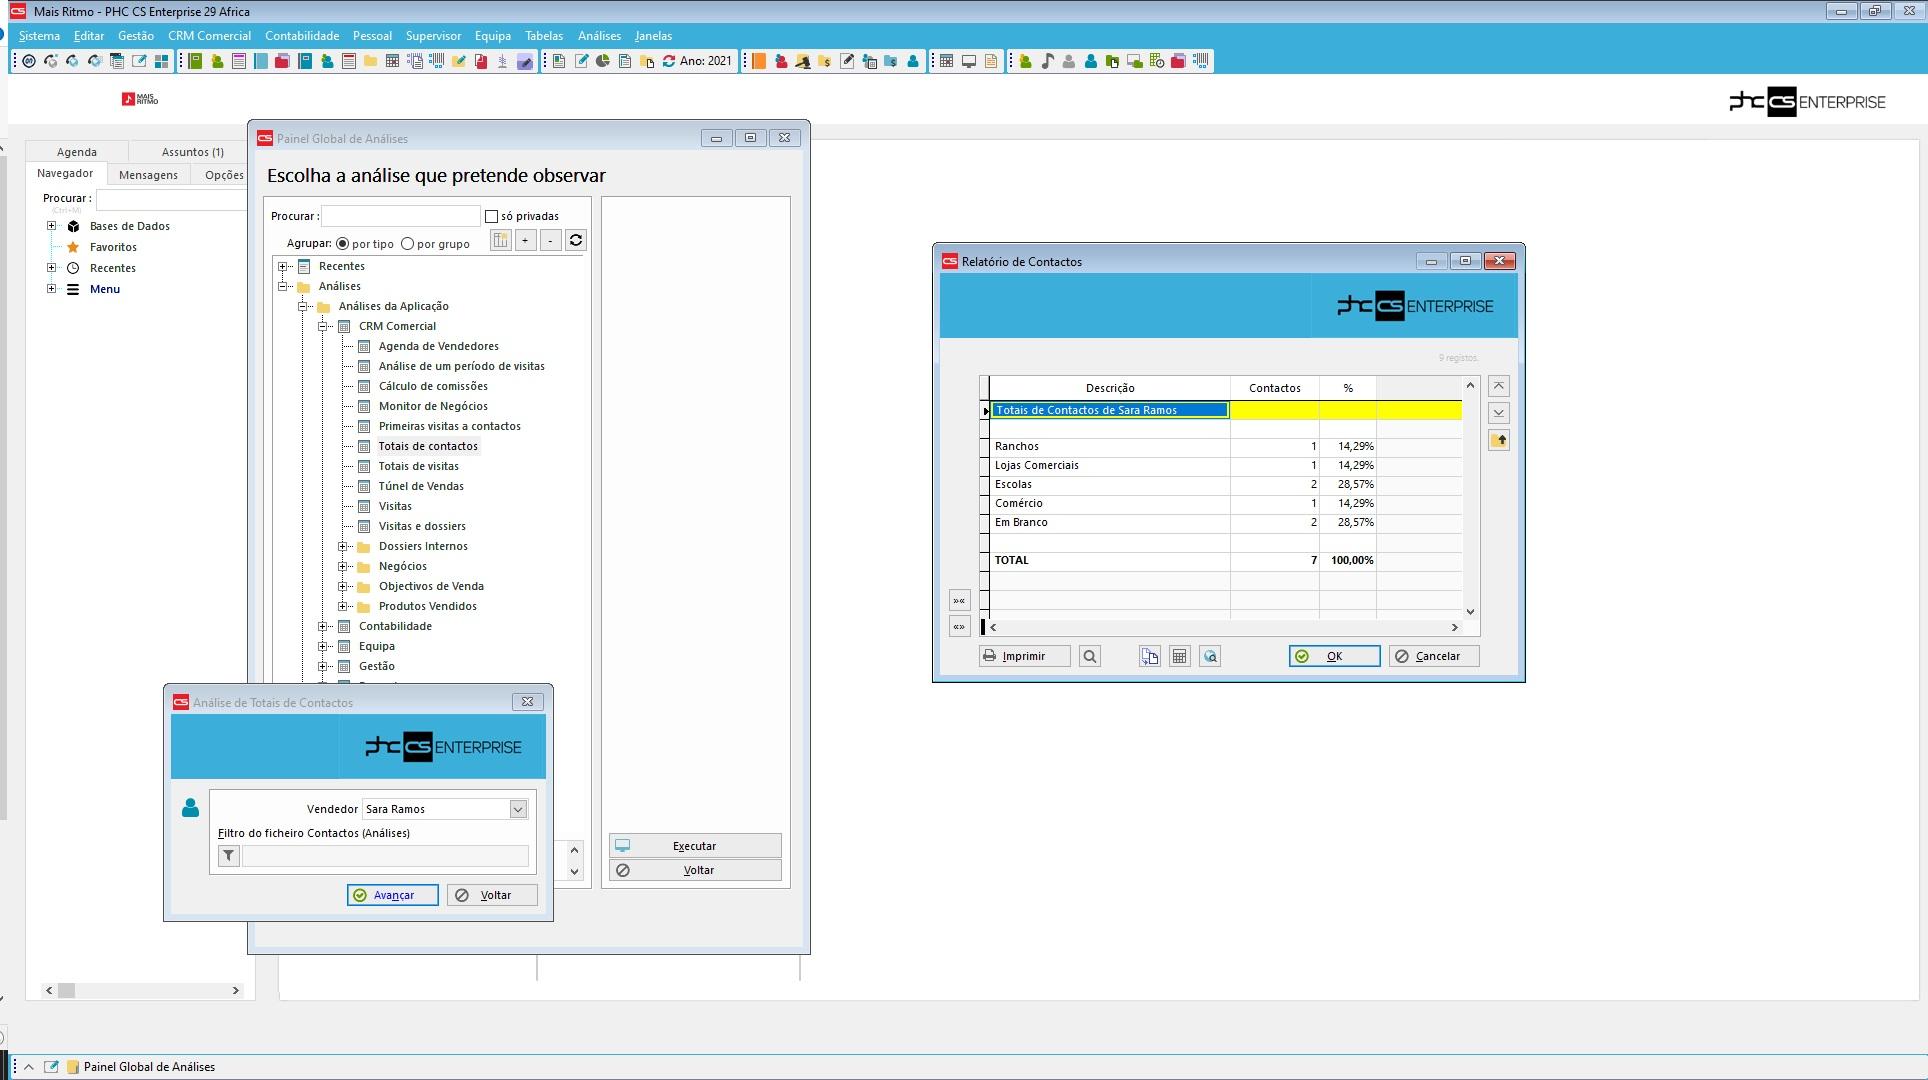 dashboard de software de crm análises e mapas